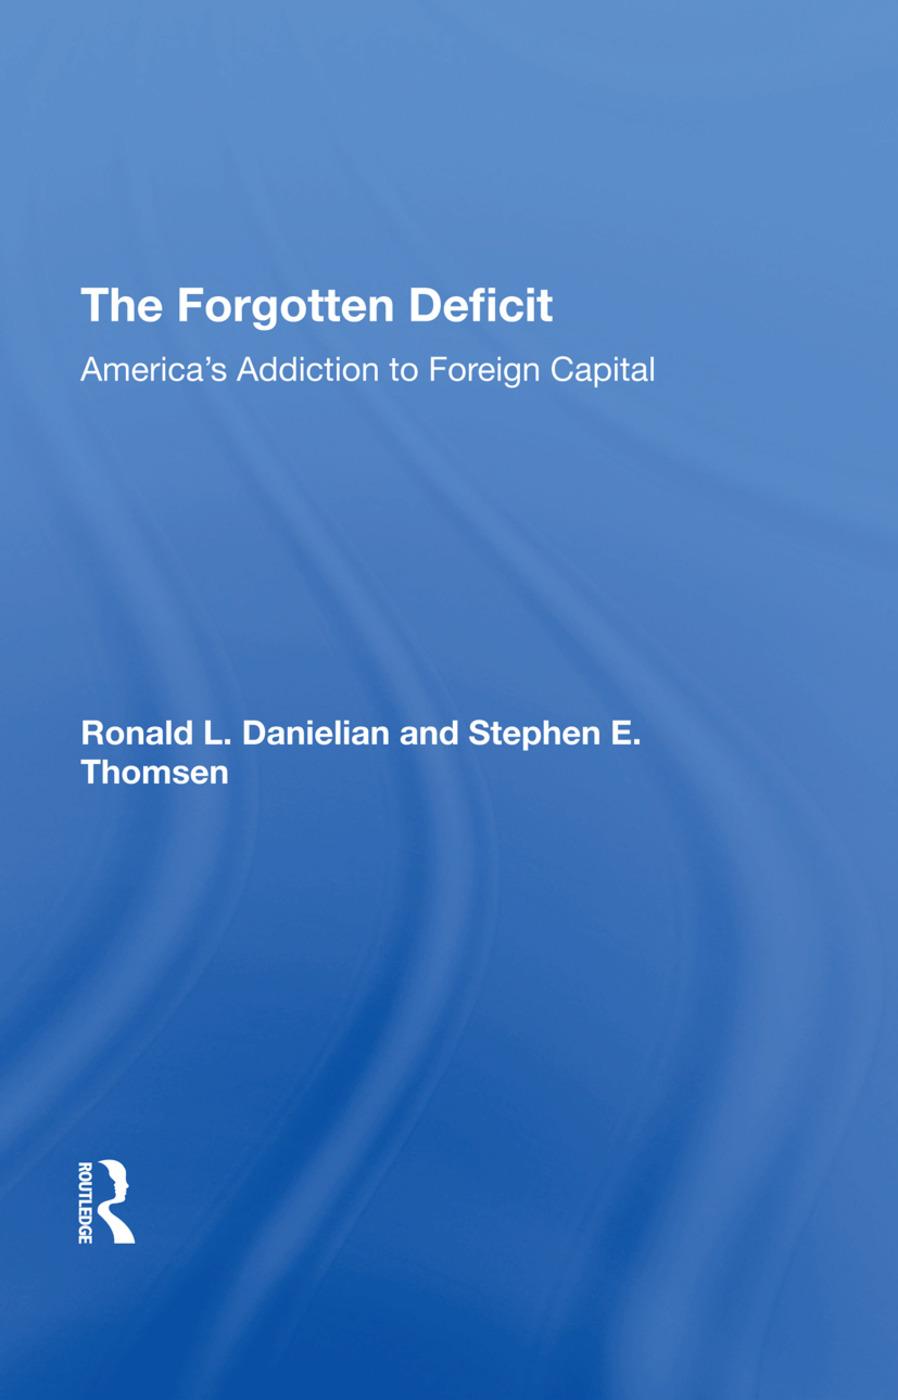 The Forgotten Deficit